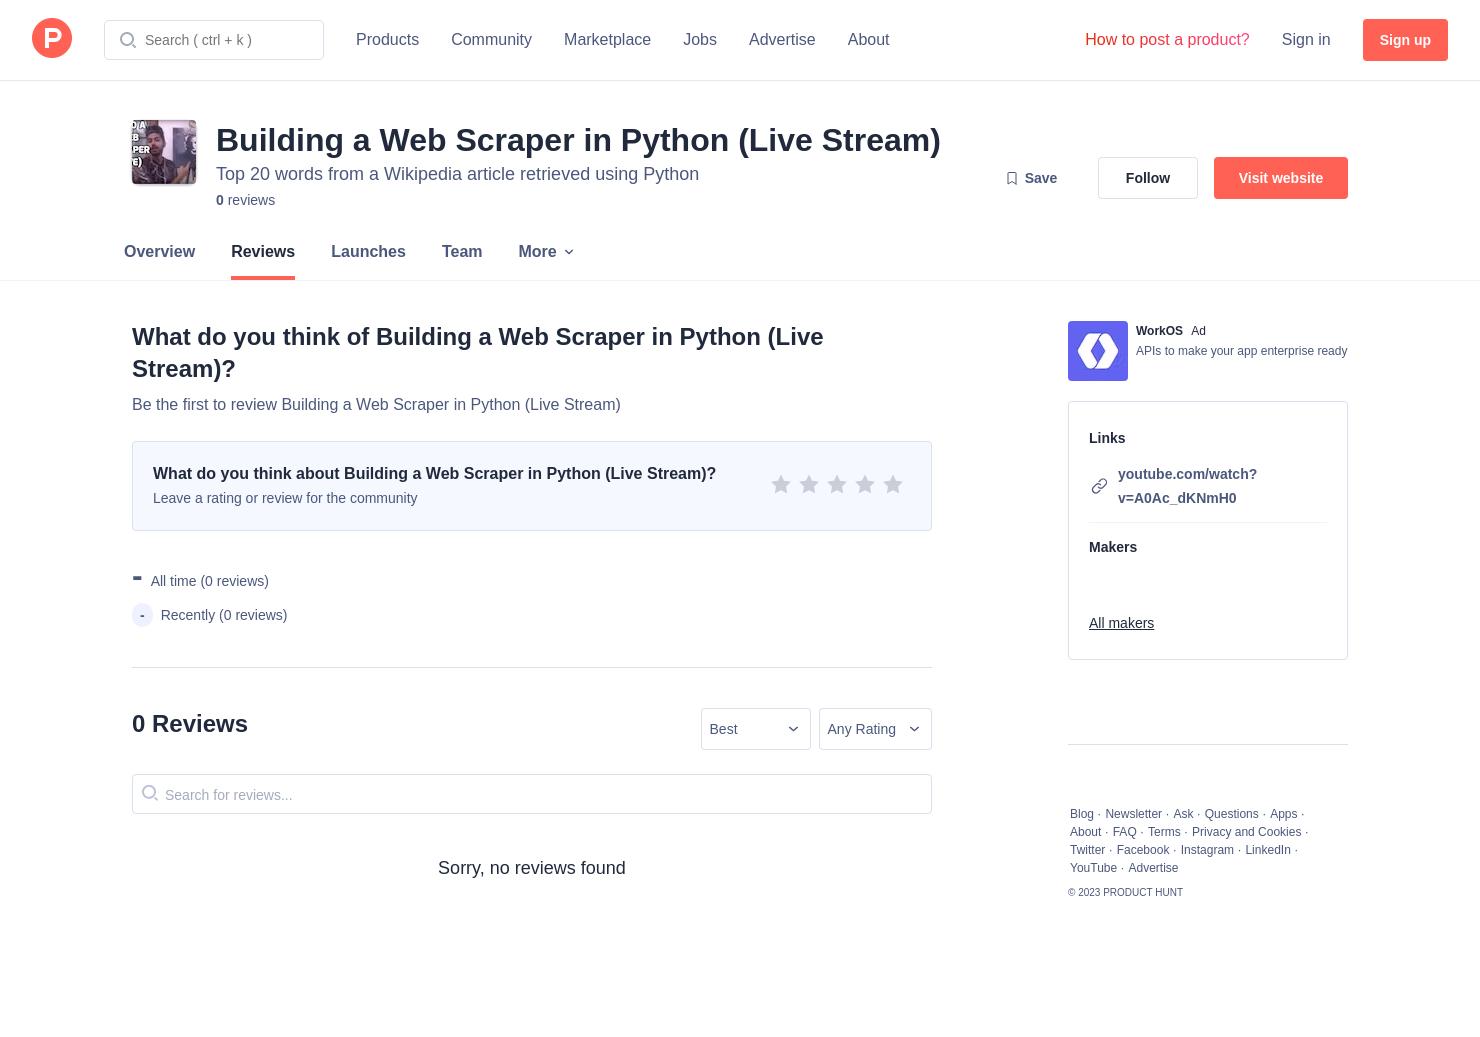 Building a Web Scraper in Python (Live Stream) Reviews